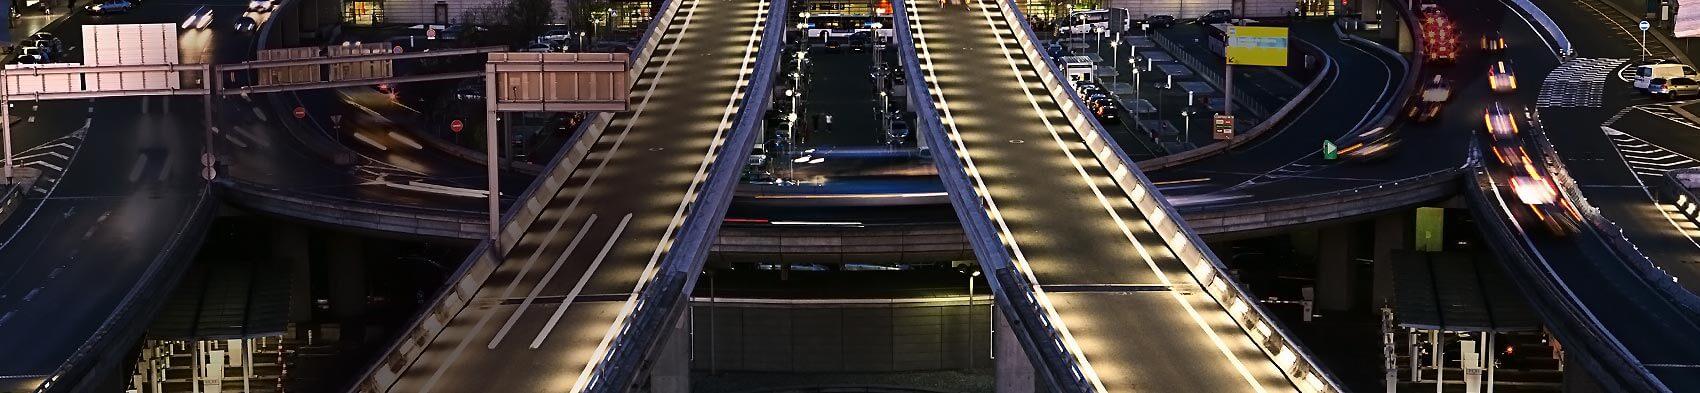 Transports En Commun Vers Orly Paris Aeroport